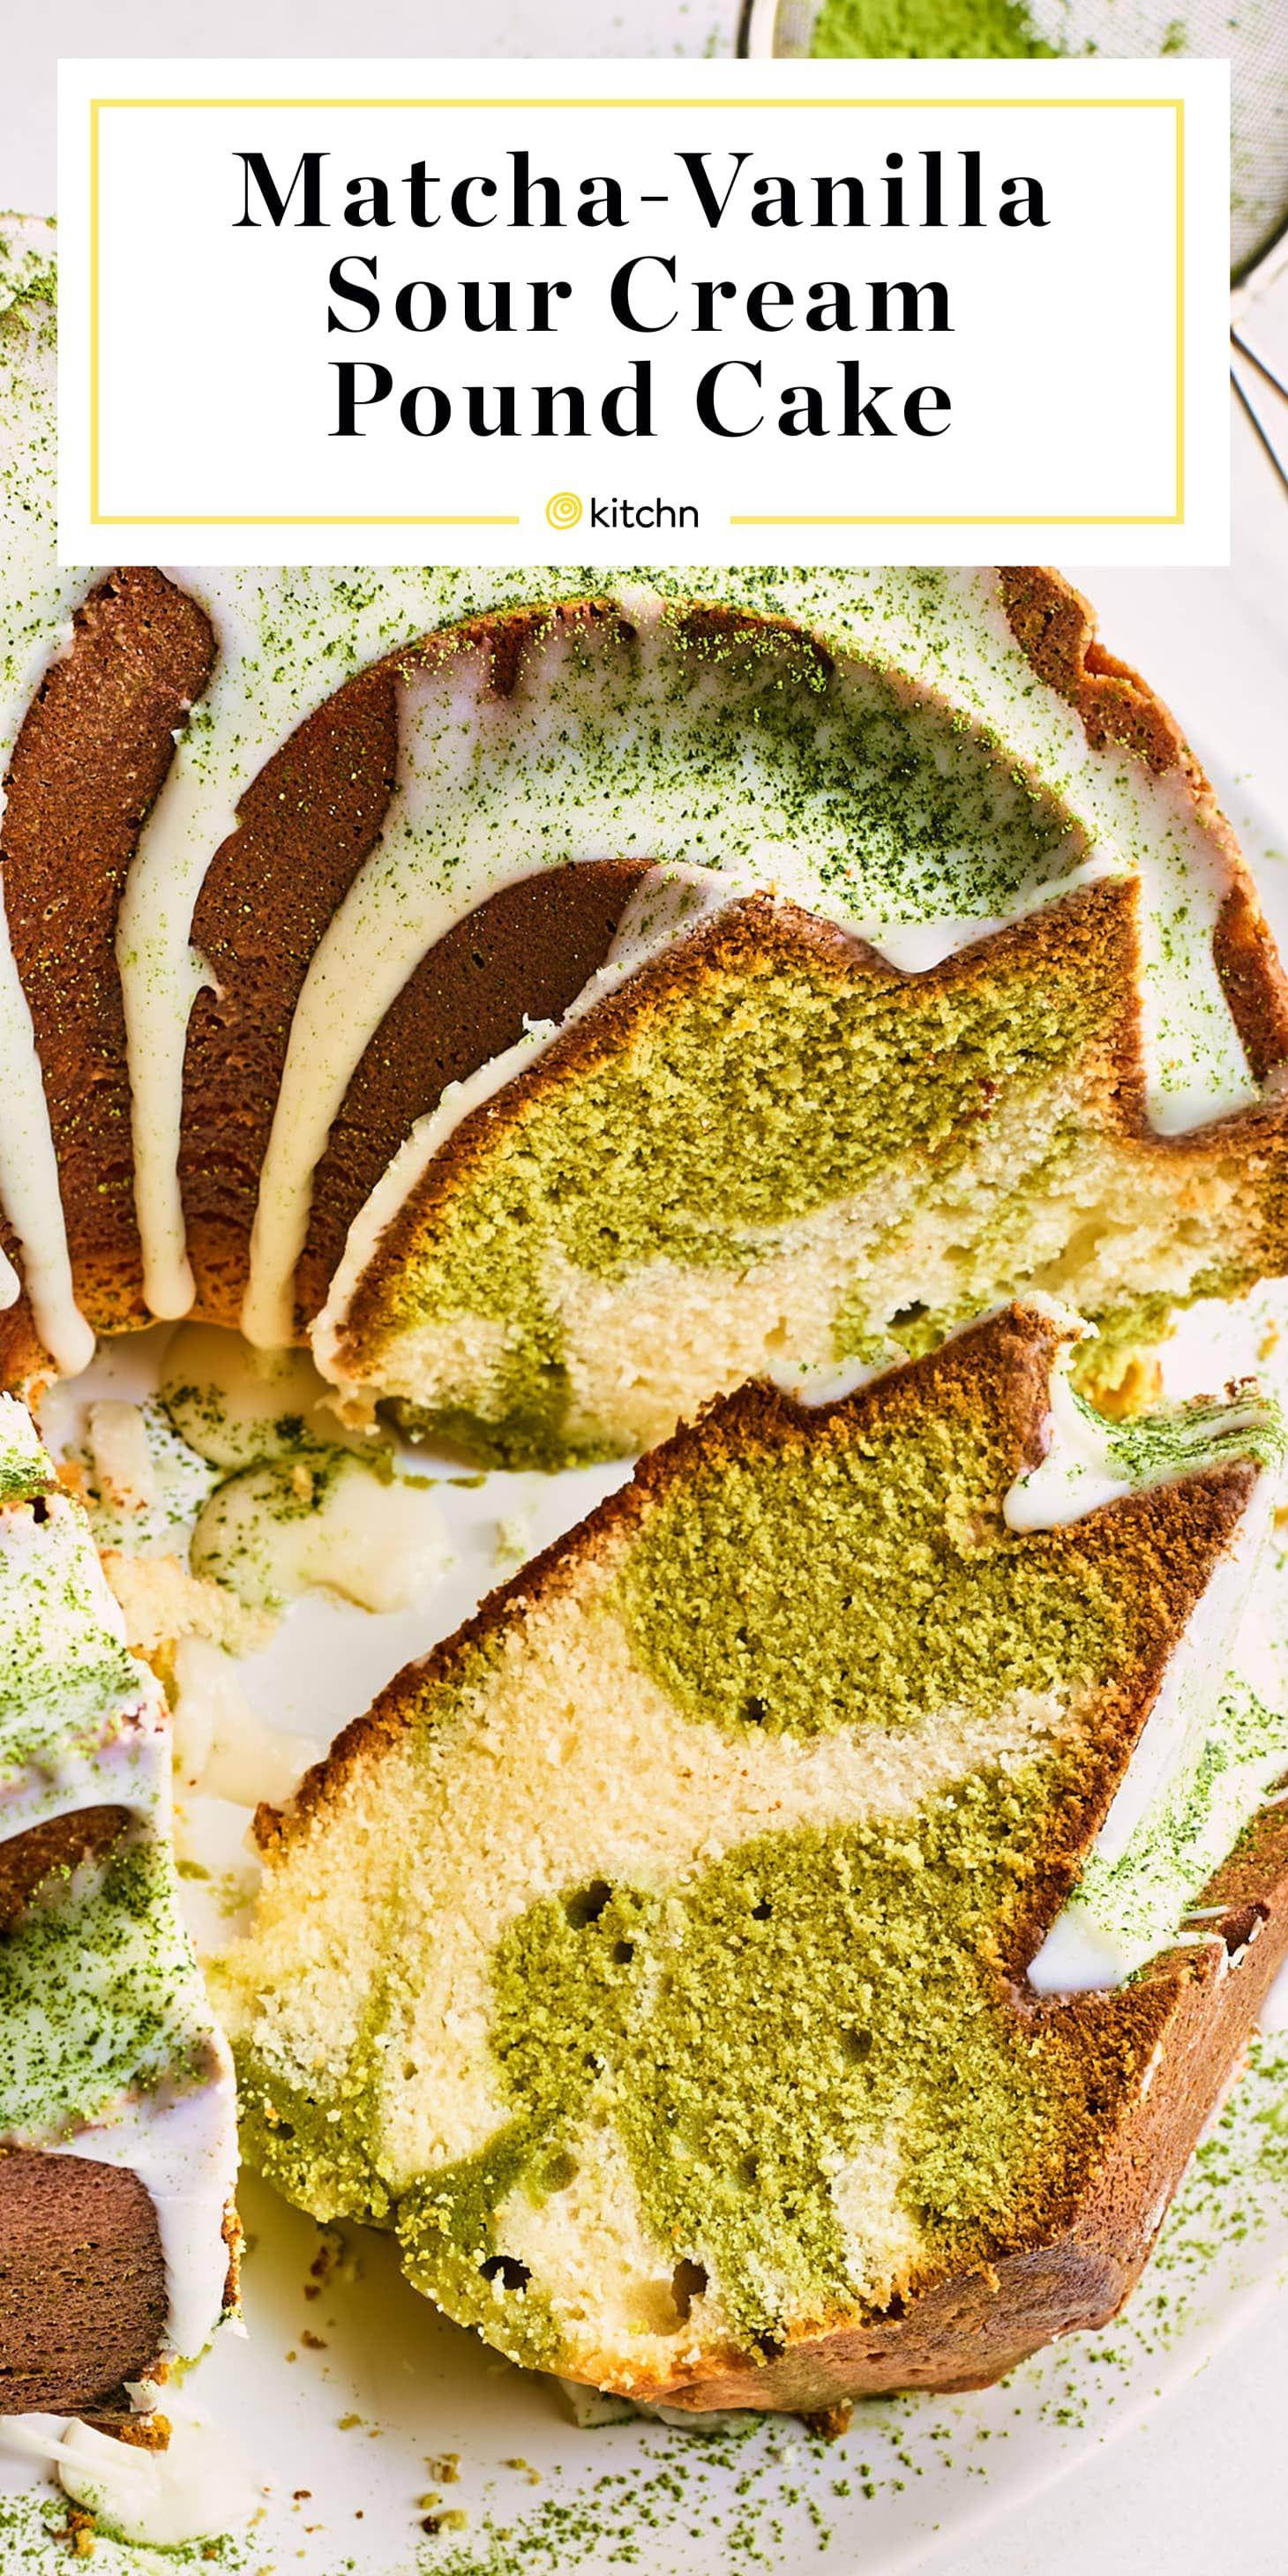 Recipe Matcha Vanilla Swirled Pound Cake Recipe Sour Cream Pound Cake Pound Cake Sour Cream Cake